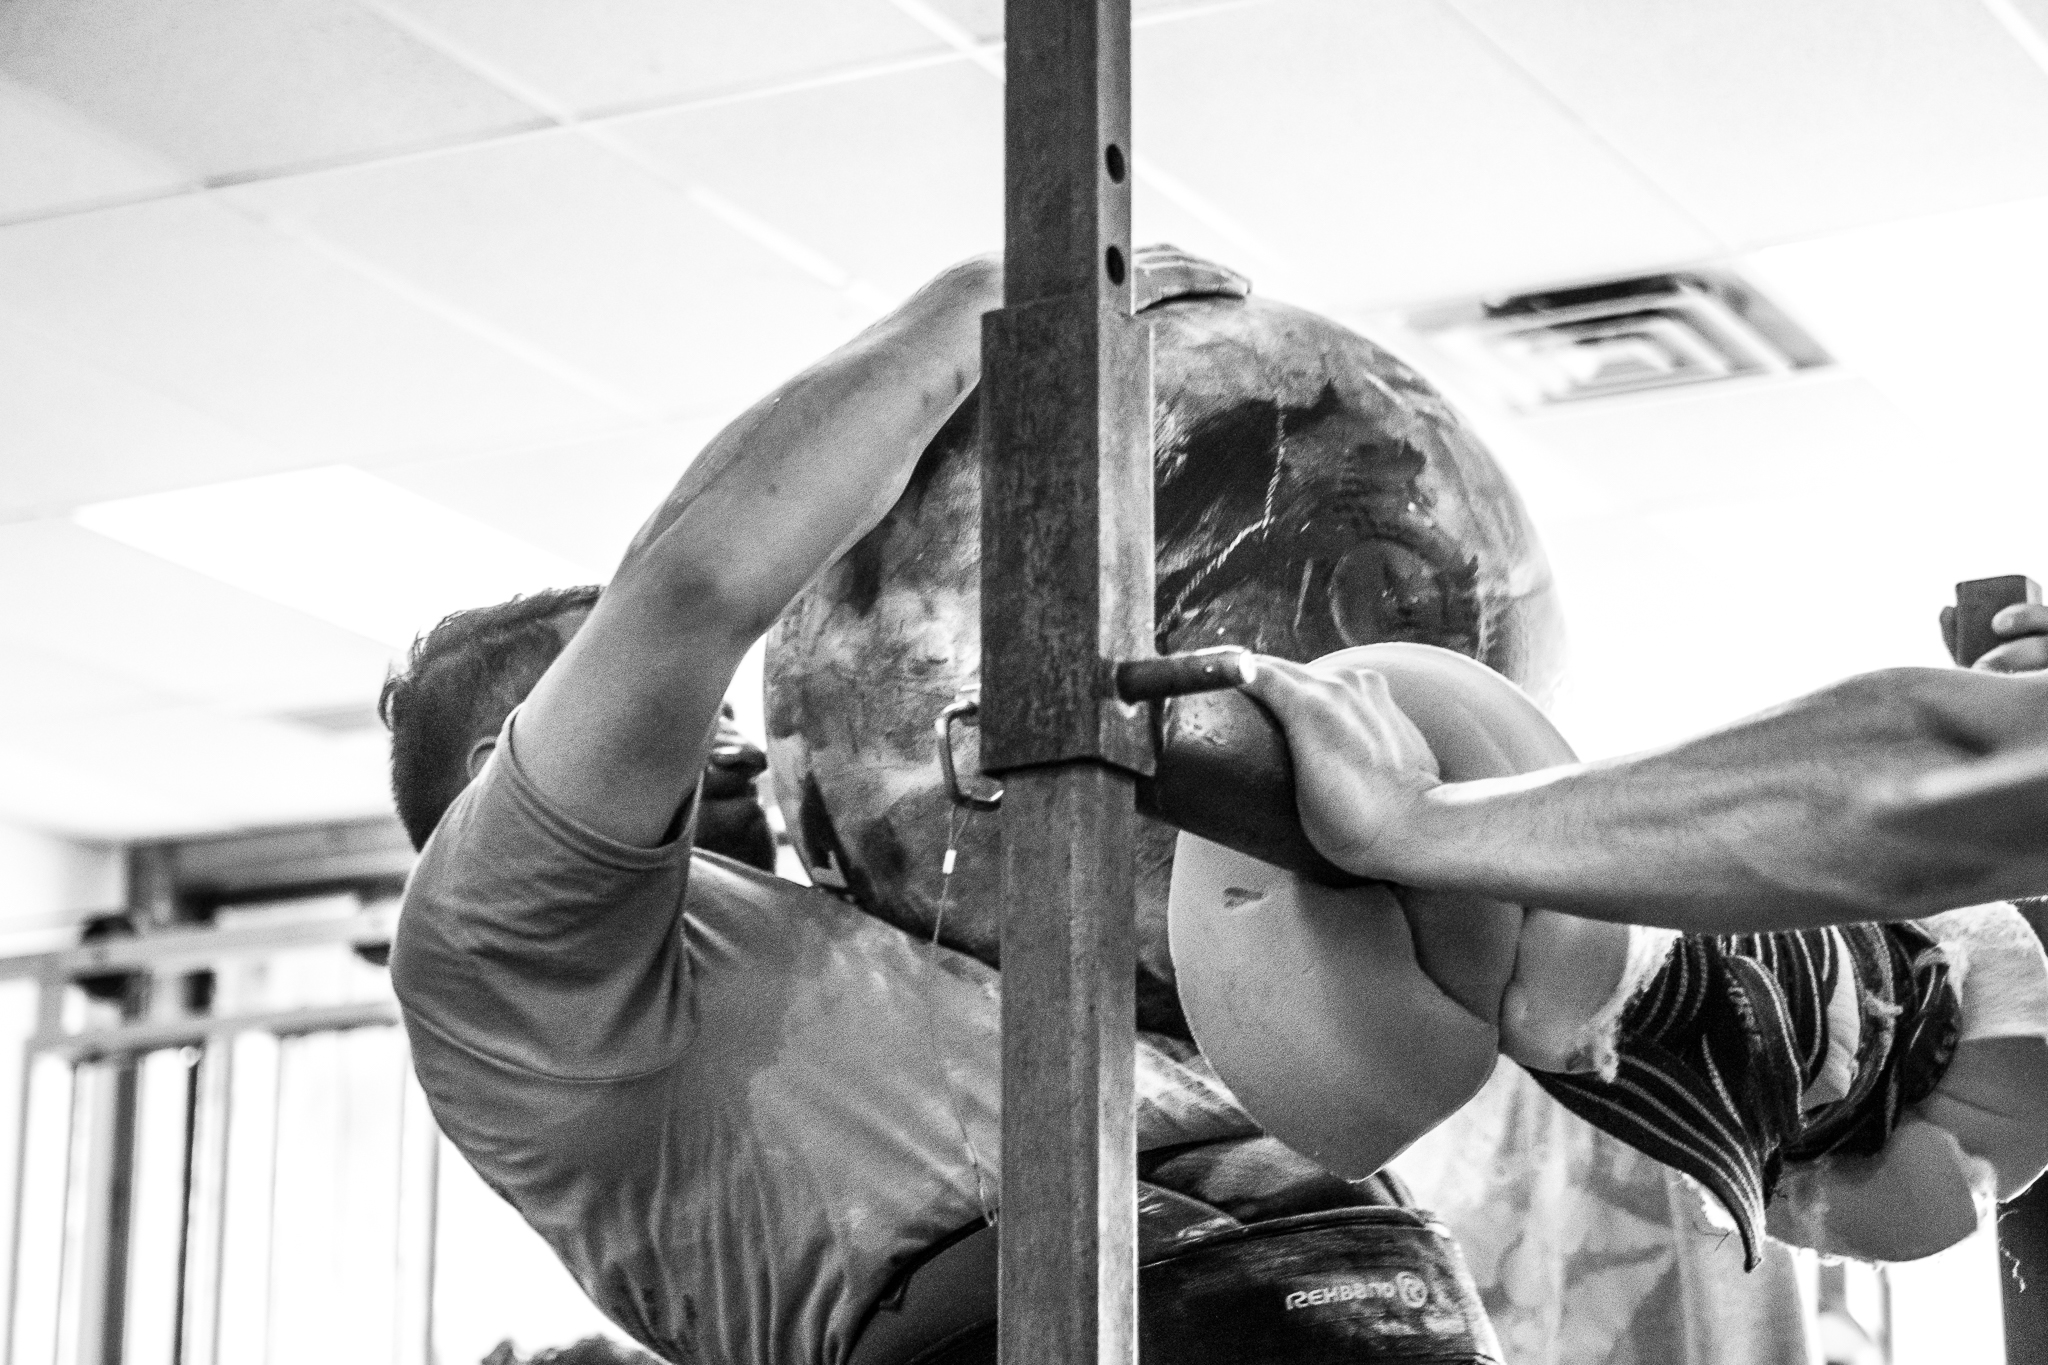 hurt-performance-4th-annual-little-viking-charity-washingtonville-new-york-strongman-eveyrdaylifters-vp (148 of 166).jpg